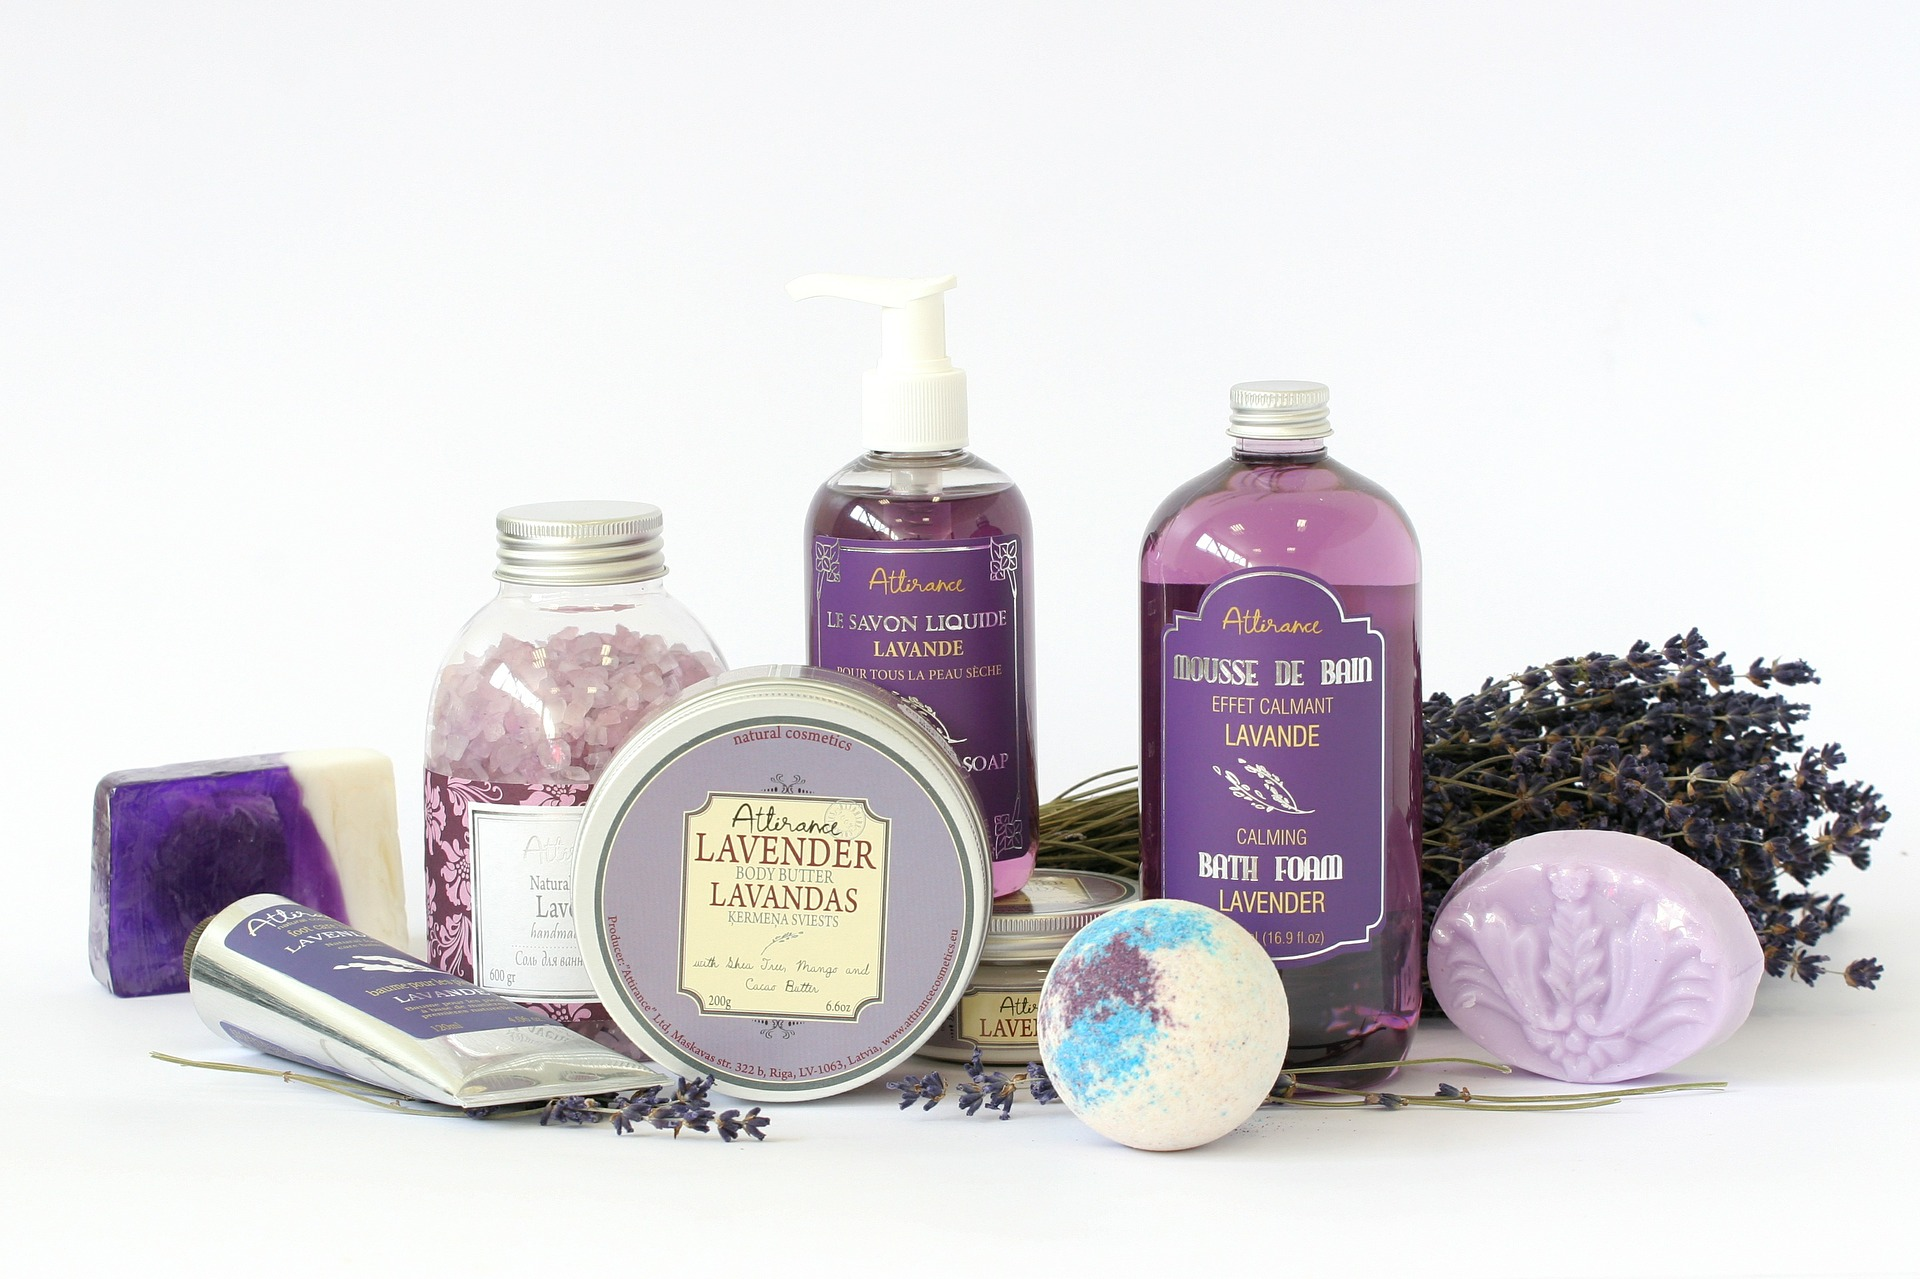 2016-02-10-5tipstohelpyoufallasleep-lavender-products